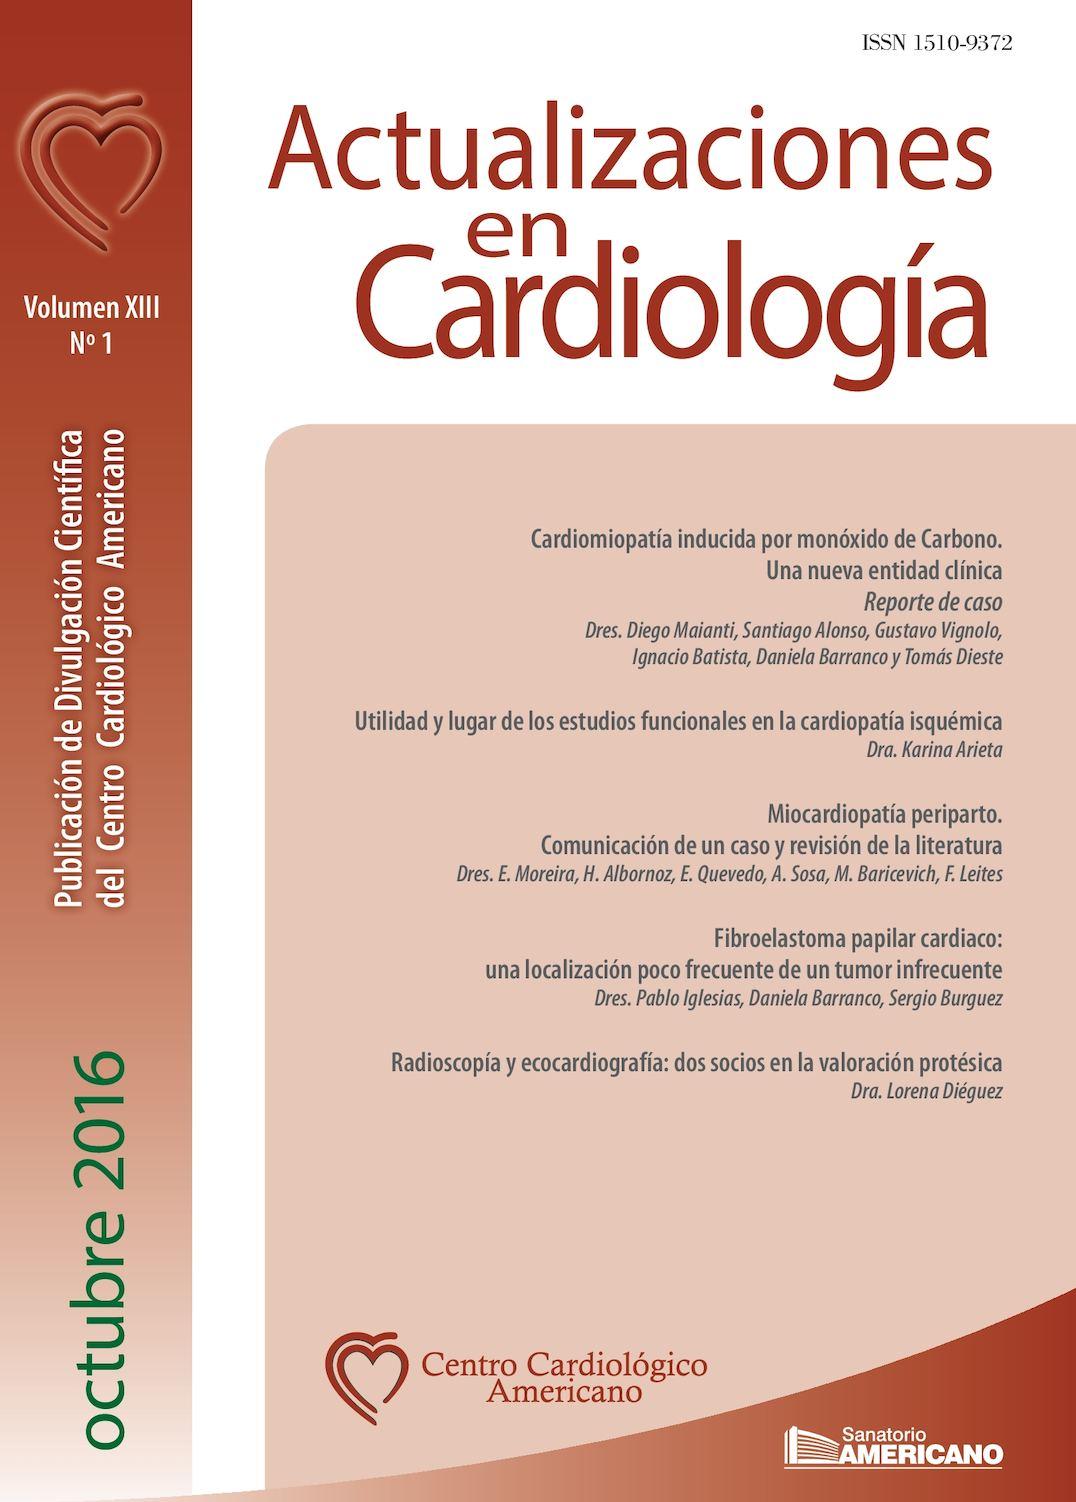 Hipertensión inducida por miocardiopatía